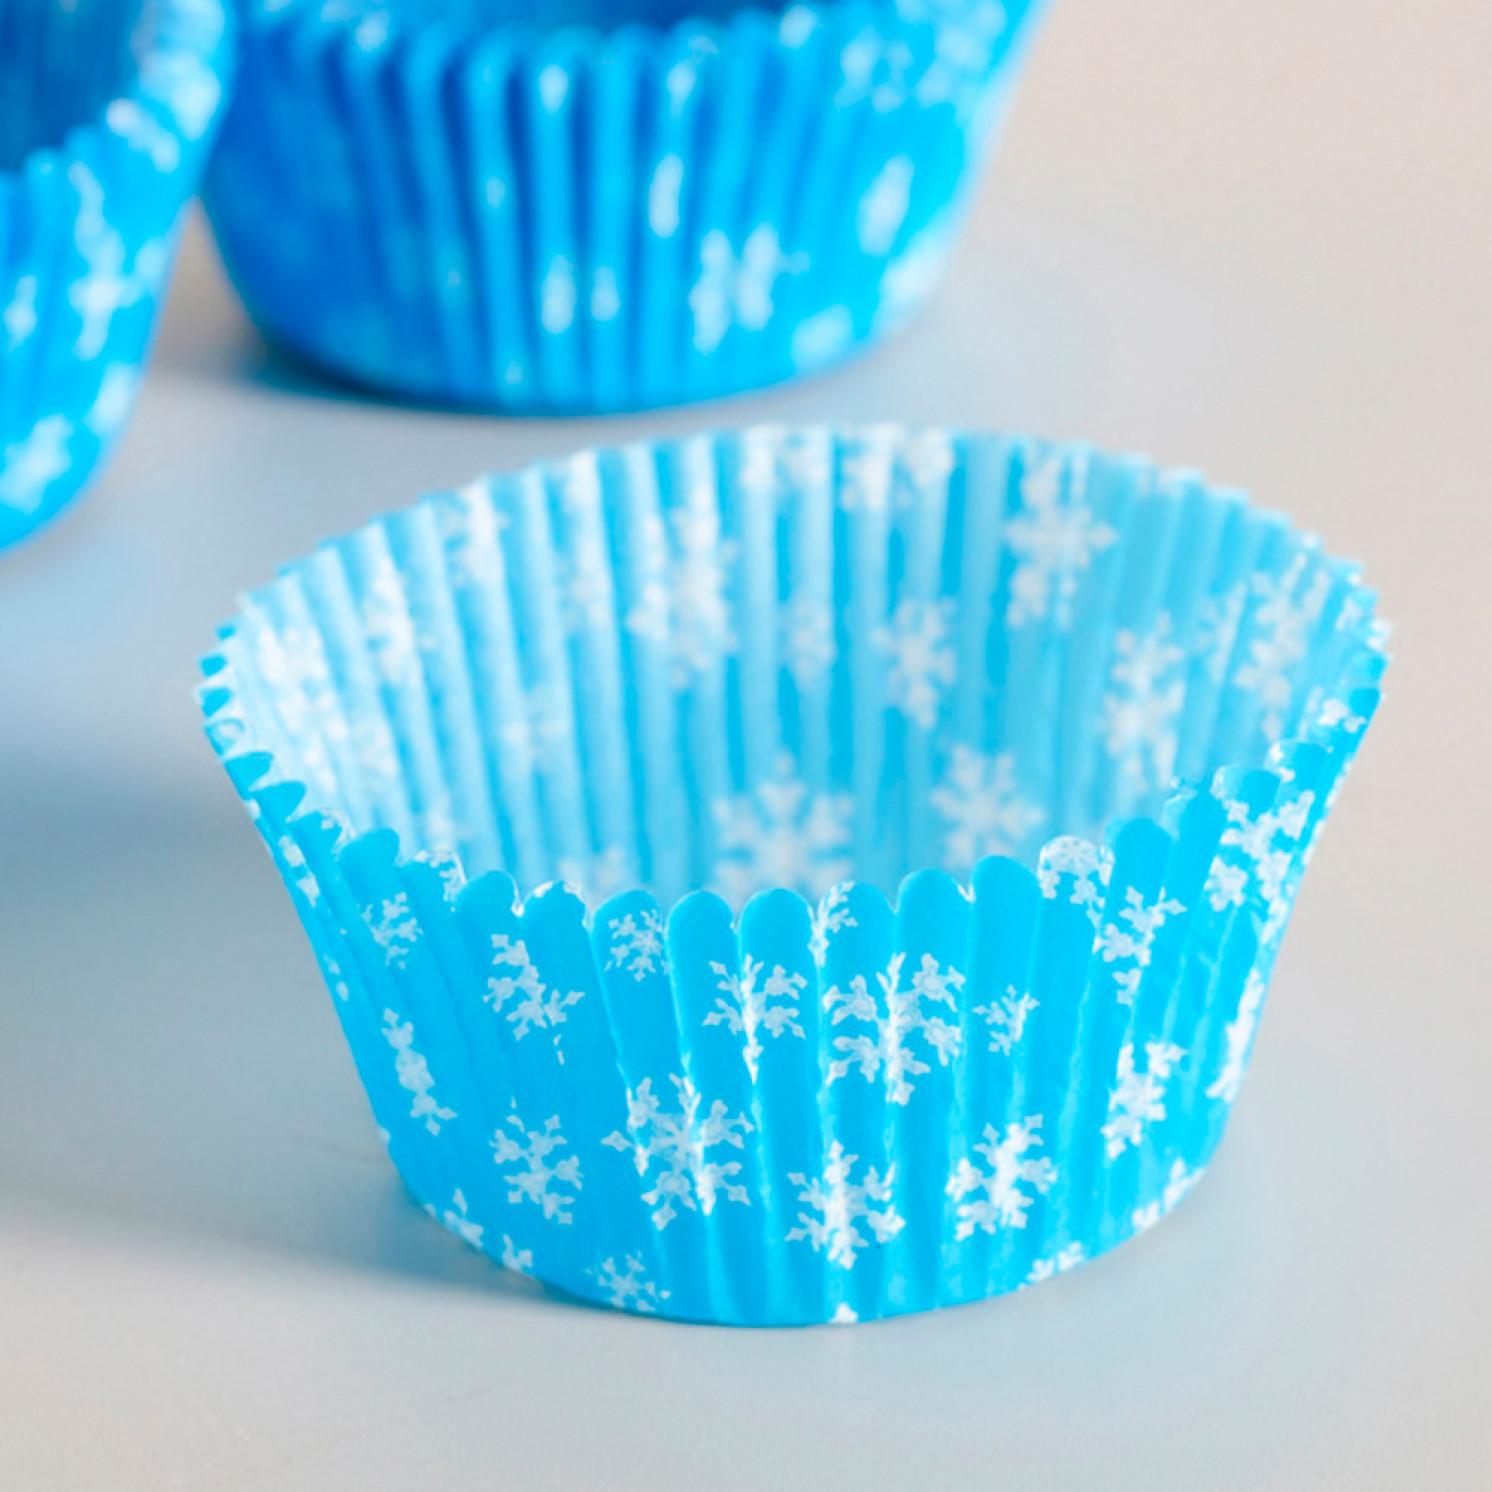 Тарталетка, голубая со снежинками, 5 х 3 см, 90 шт